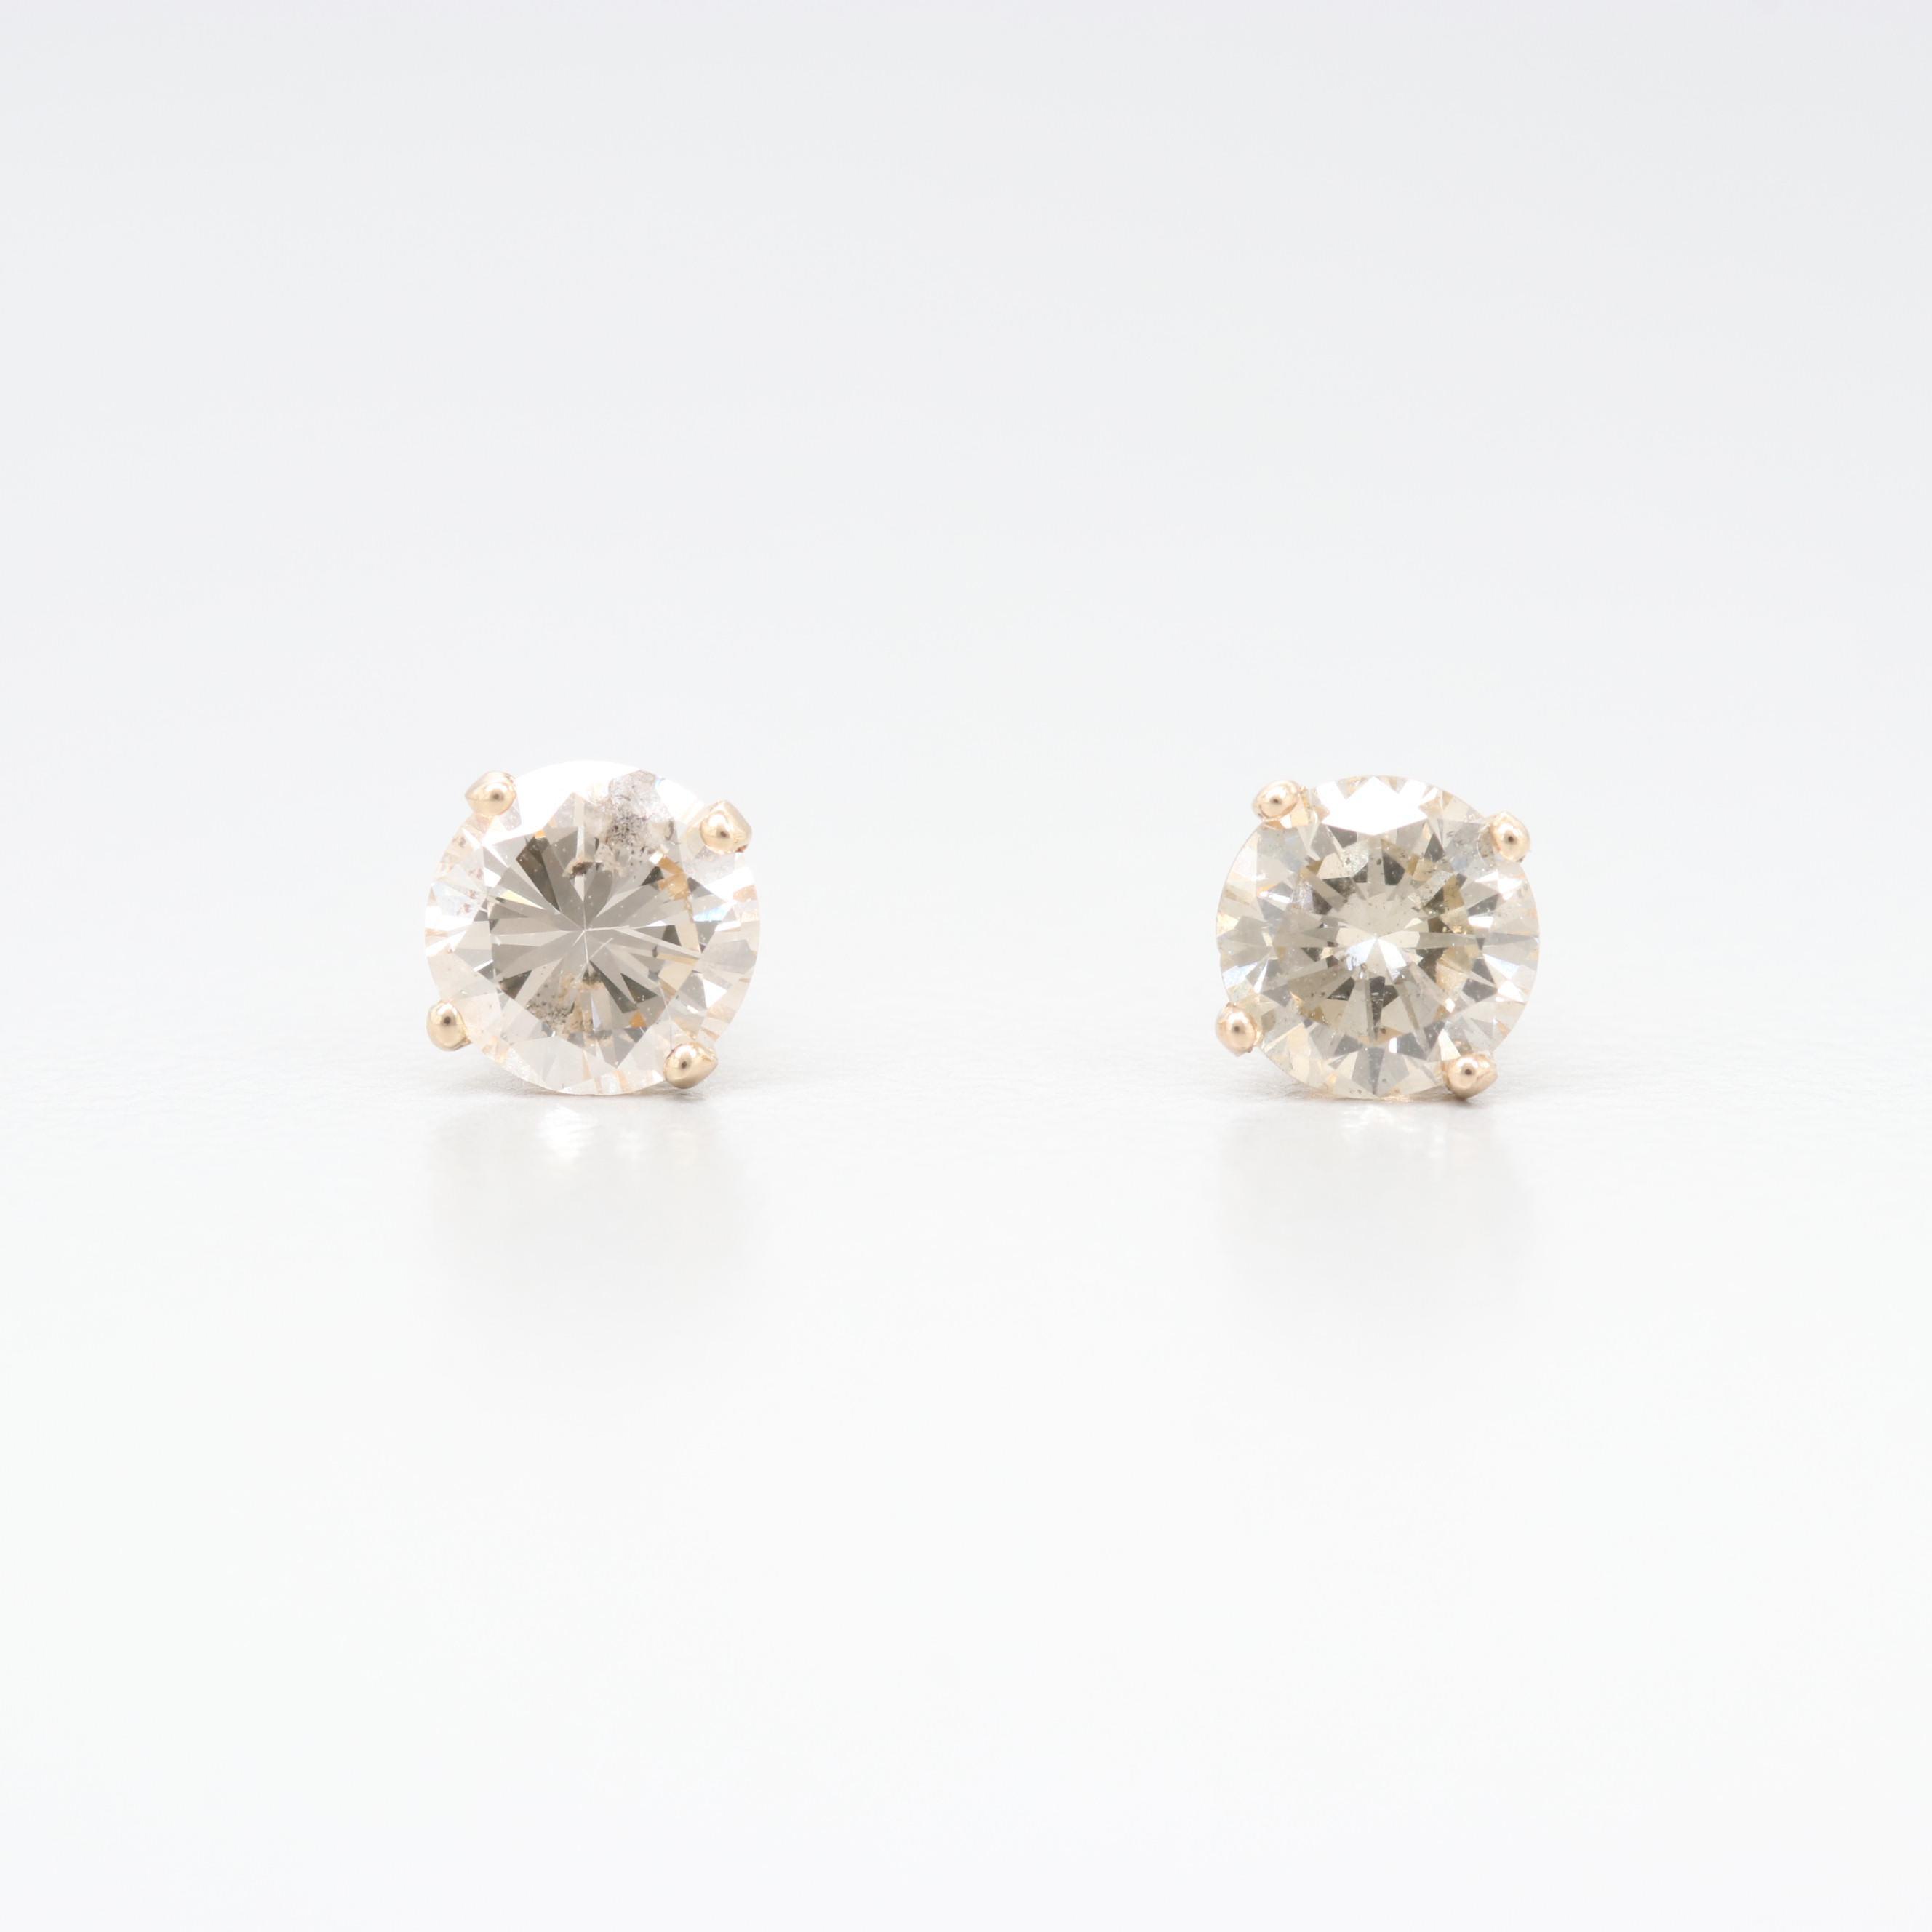 14K Yellow Gold 1.05 CTW Diamond Stud Earrings